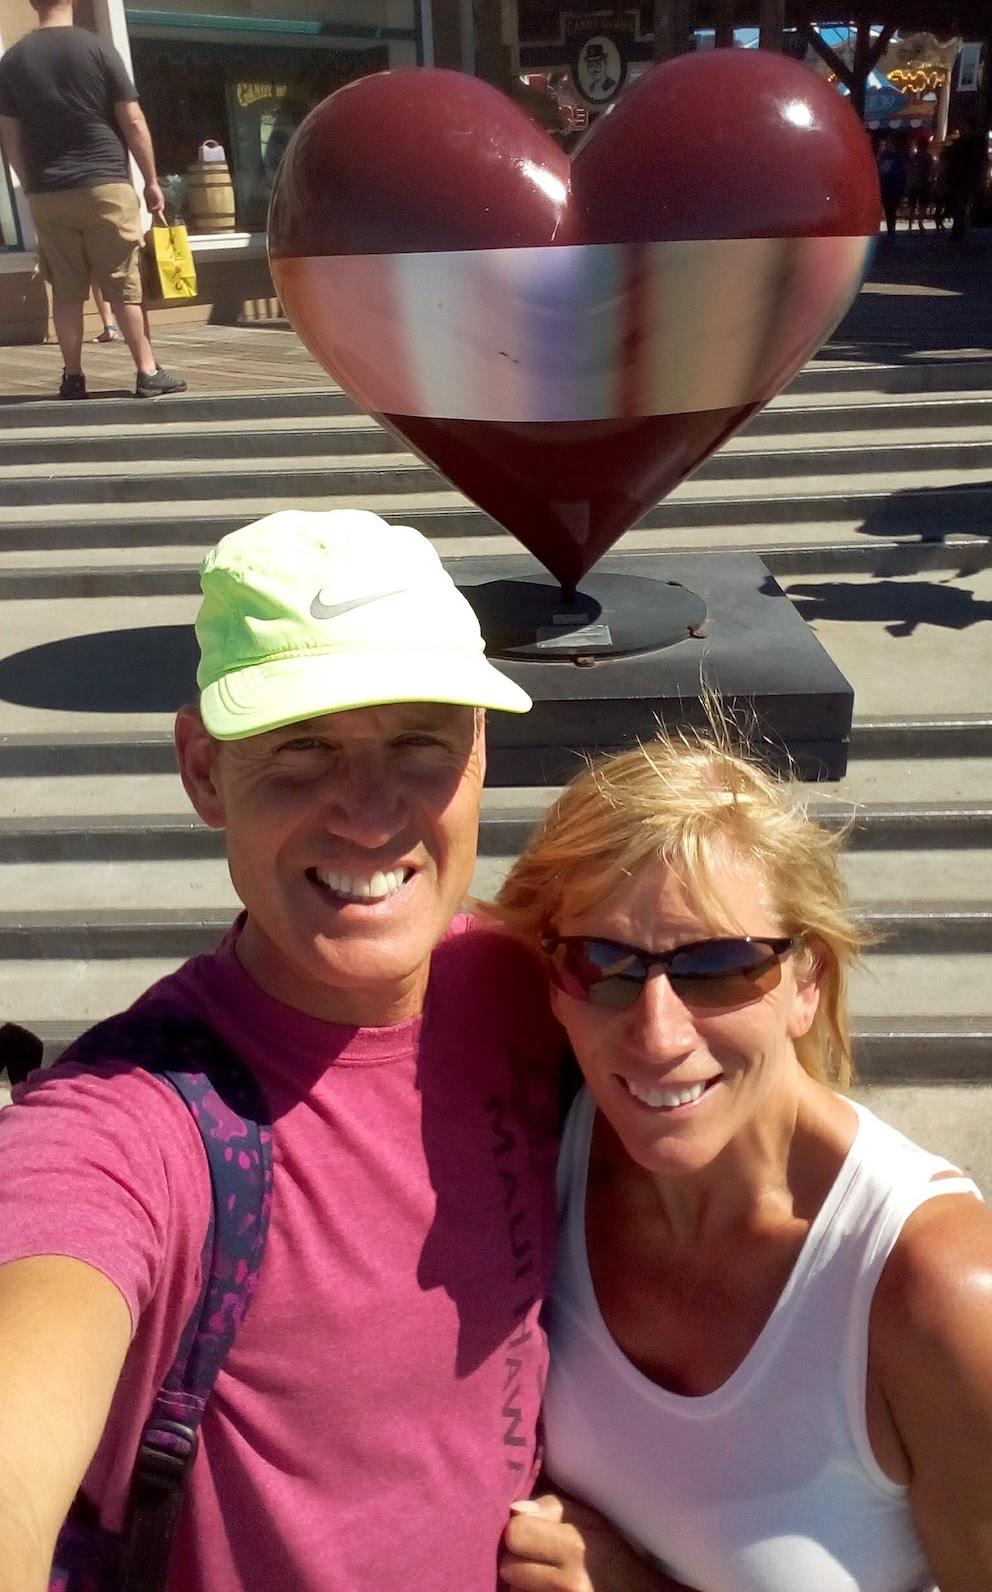 San Francisco Bay Area - Pier 39 heart statue